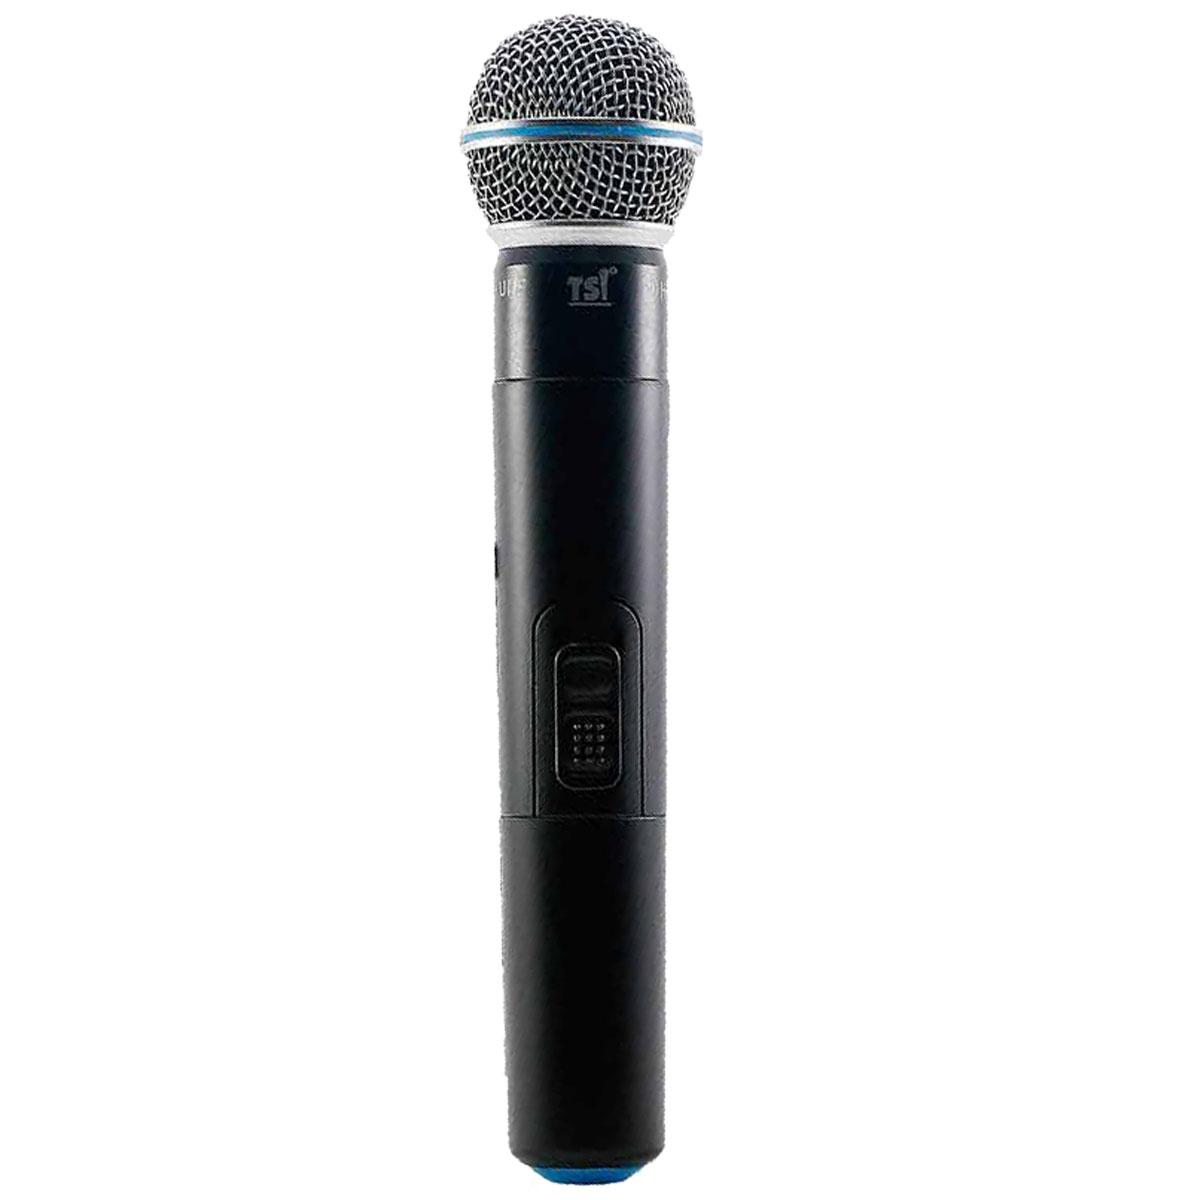 Microfone s/ Fio de Mão UHF - MS 115 UHF PLUS TSI